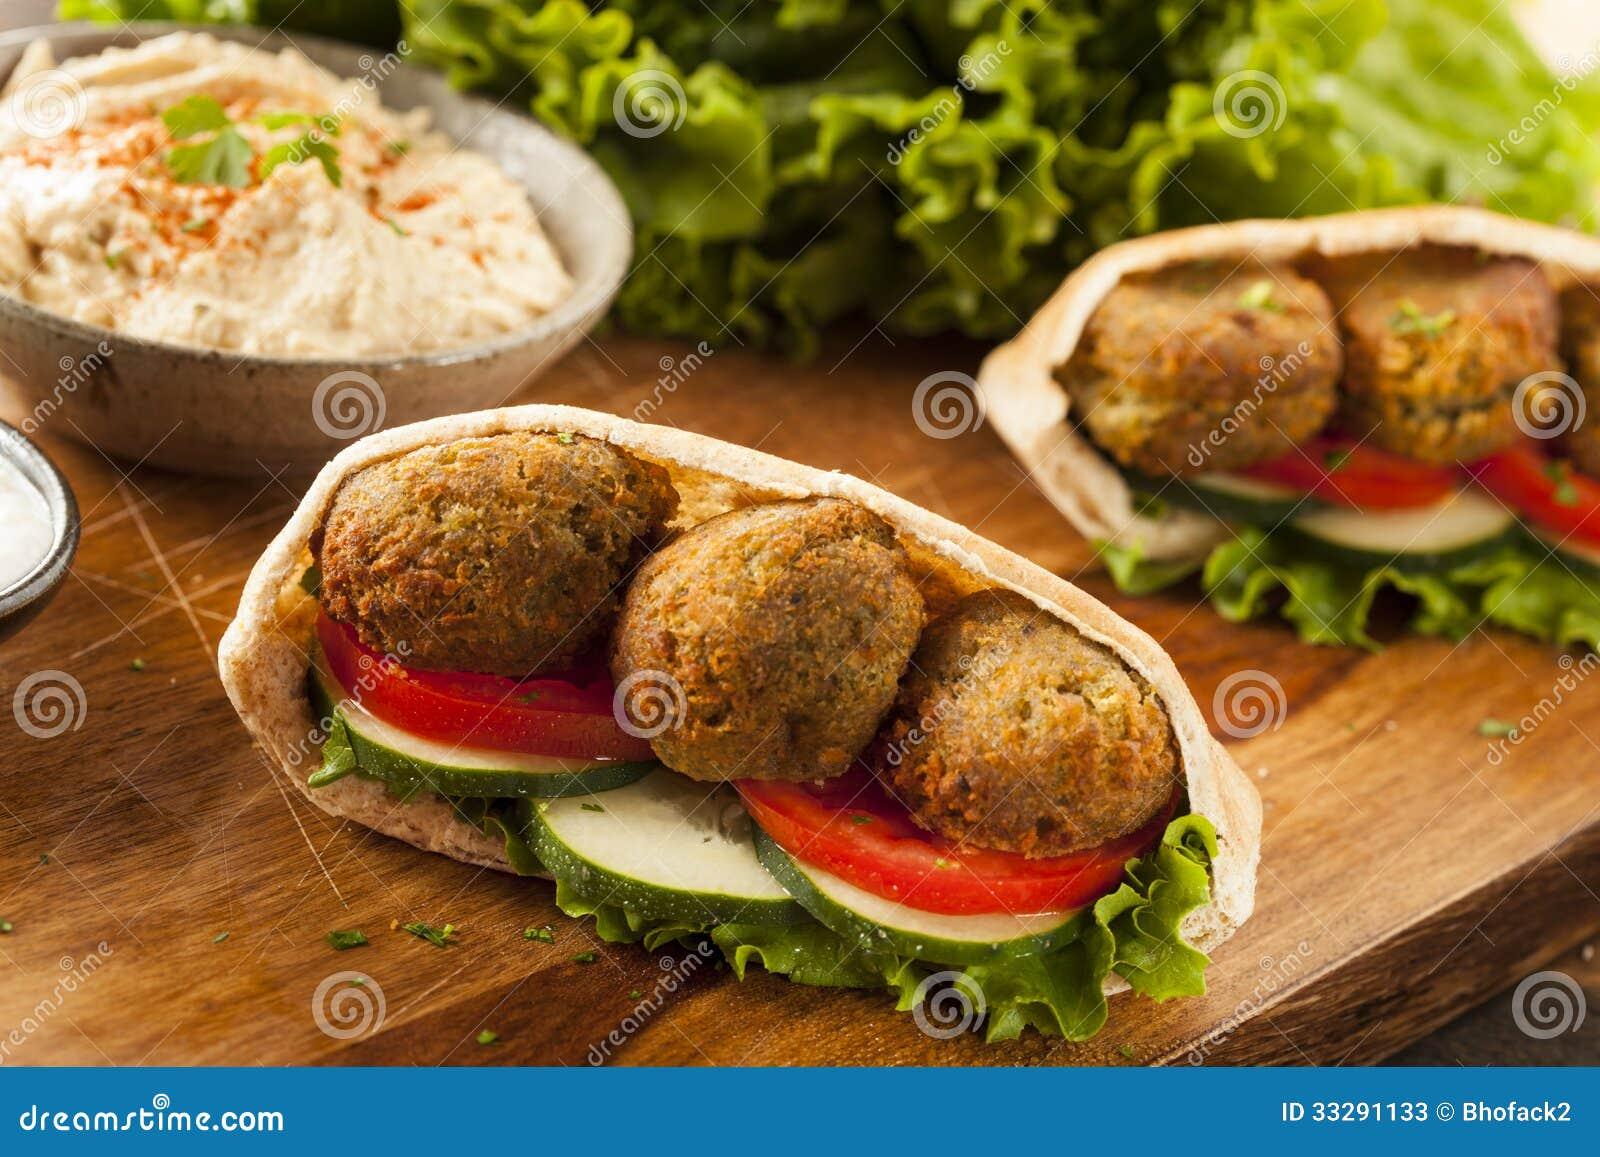 Organic Falafel In A Pita Pocket Stock Photos - Image ...